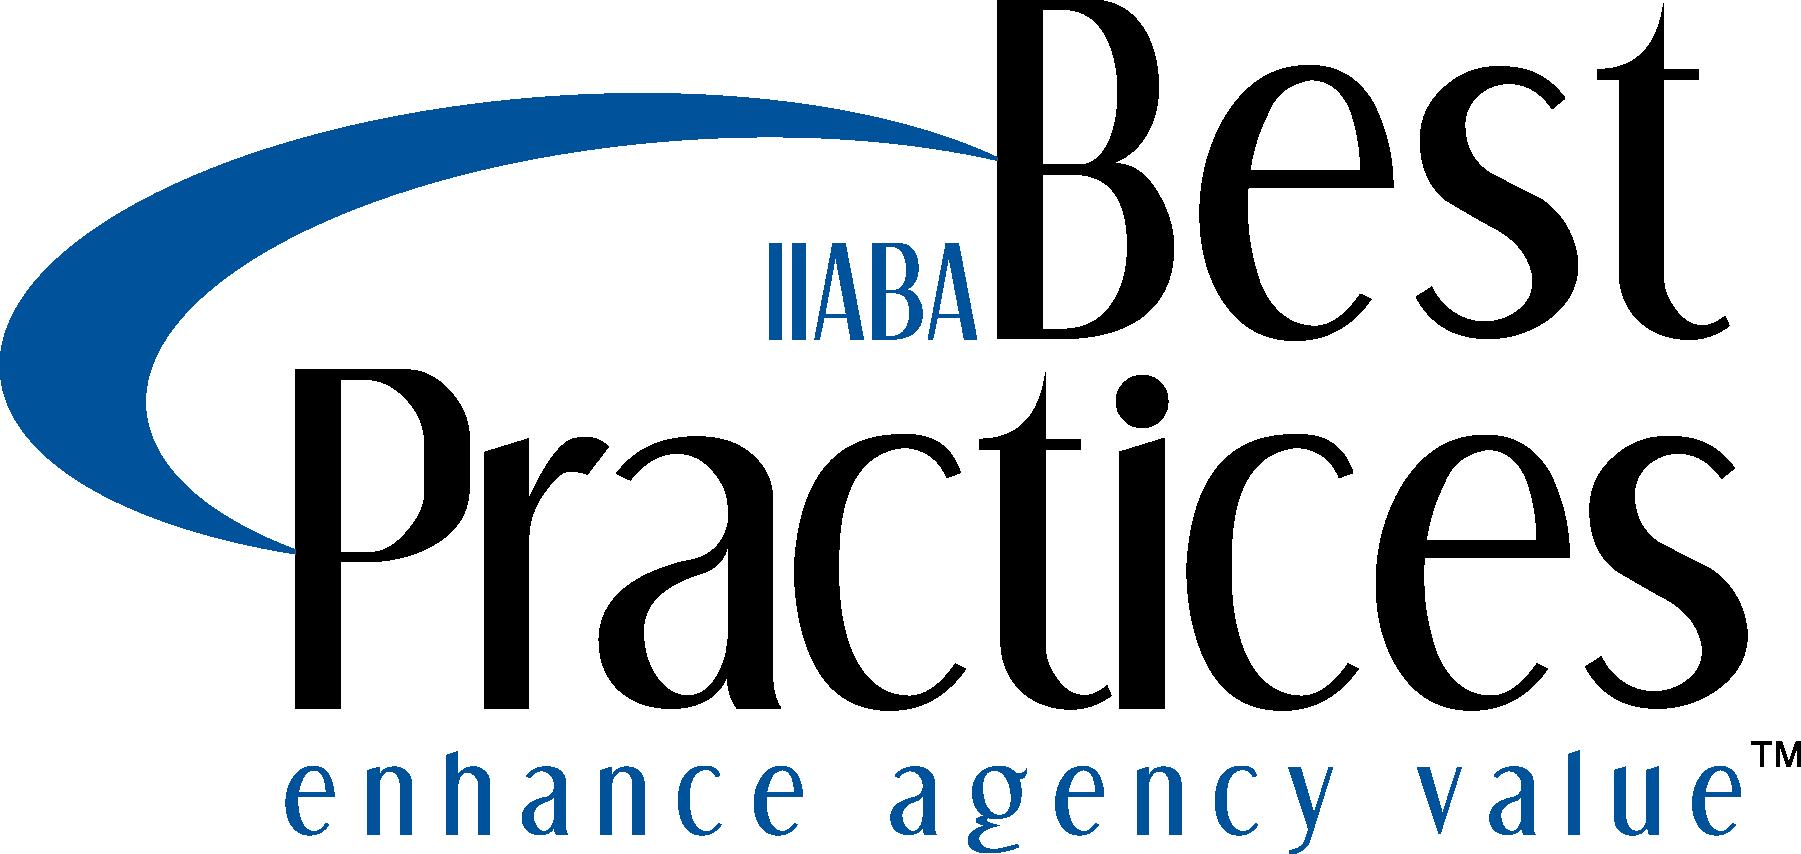 2015 BPA Logo without background